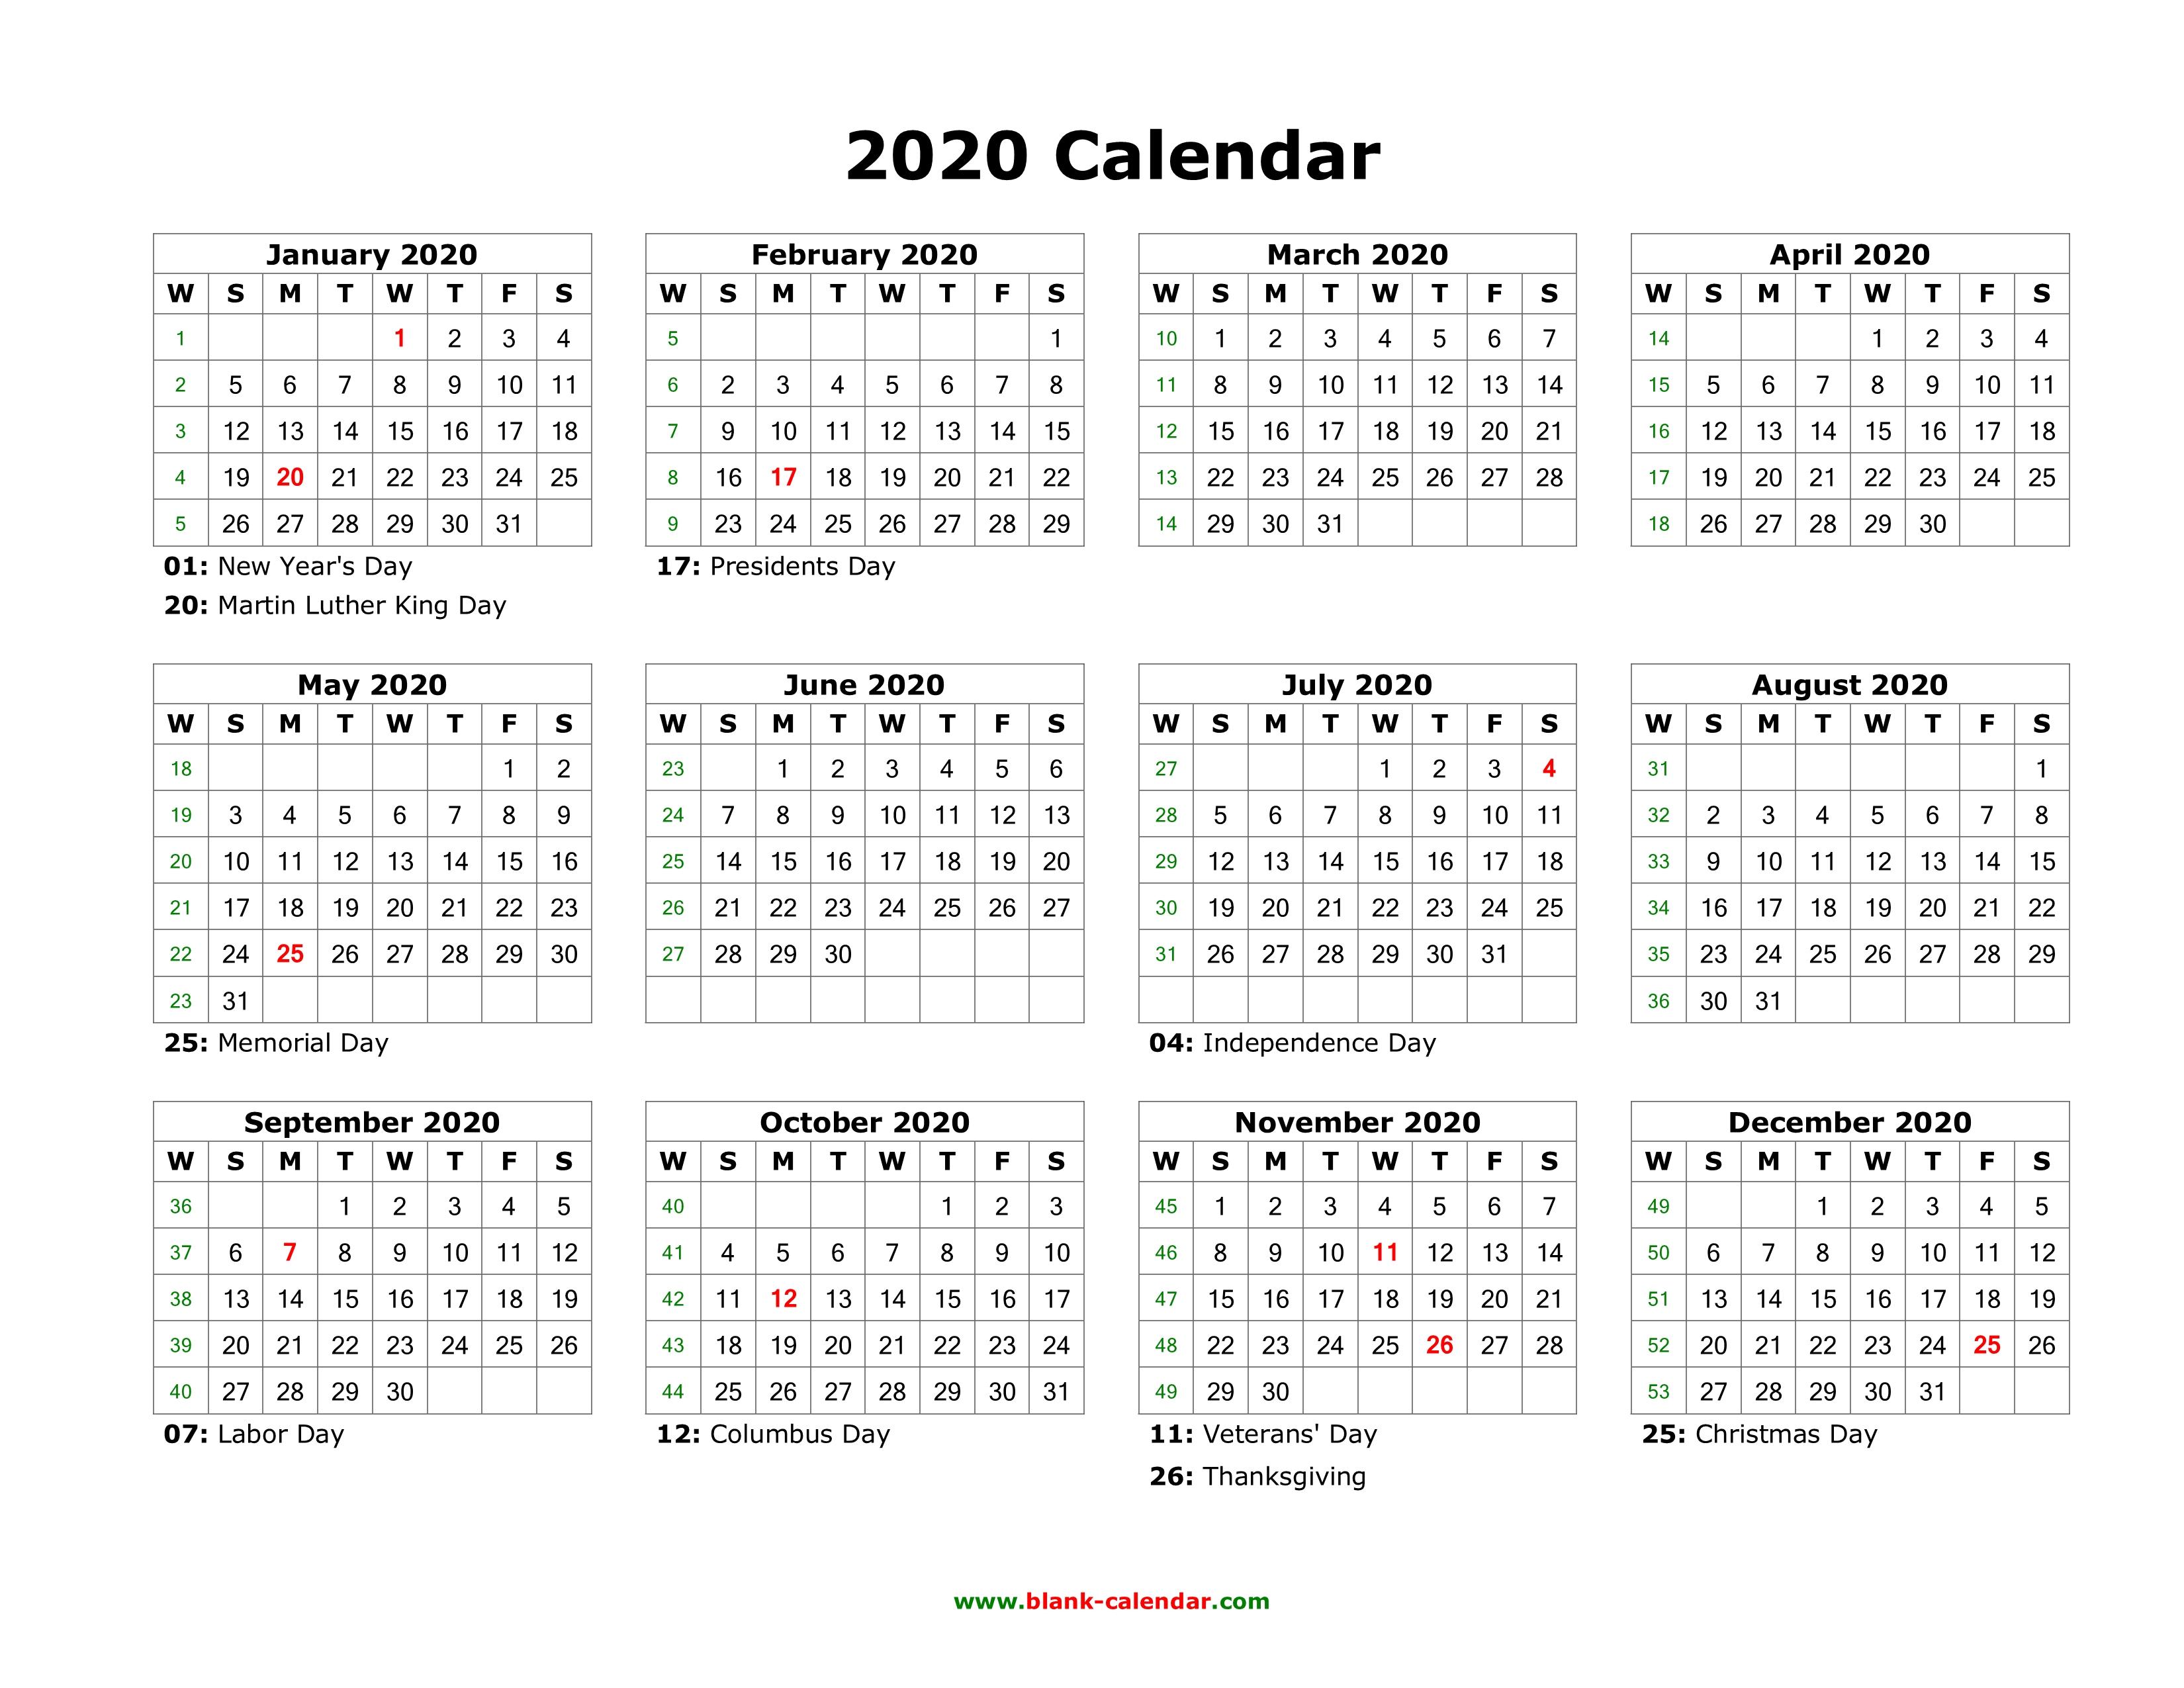 Blank Calendar 2020 | Free Download Calendar Templates regarding Printable Calendar 2020 Monday To Sunday